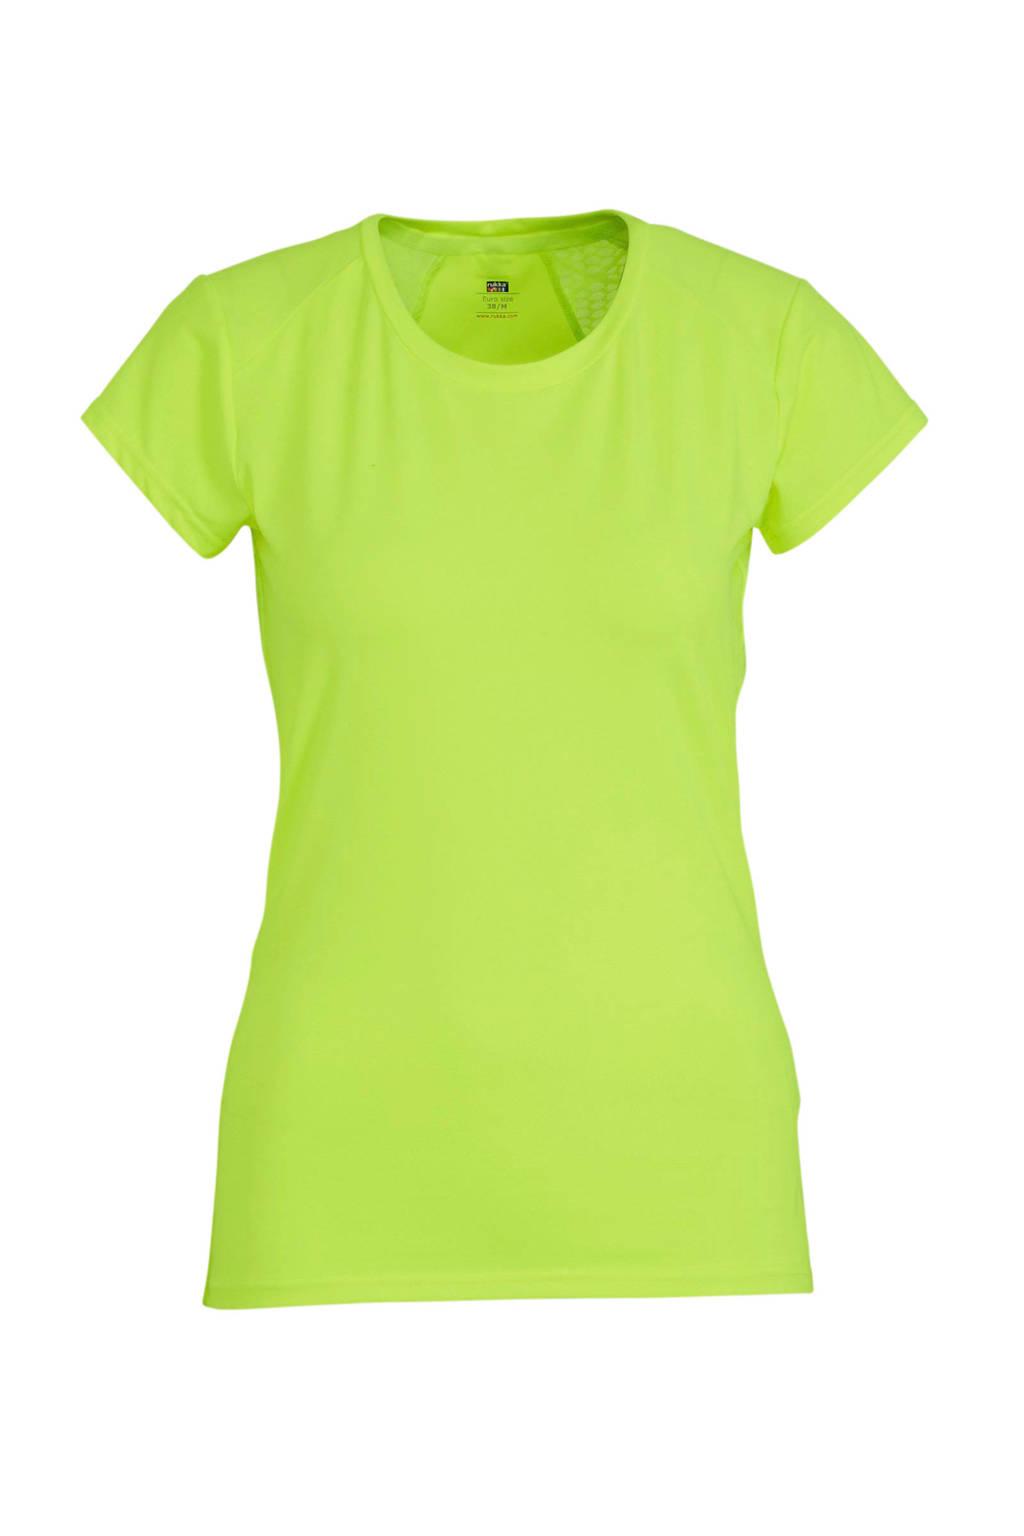 Rukka hardloopshirt neon geel, Neon geel